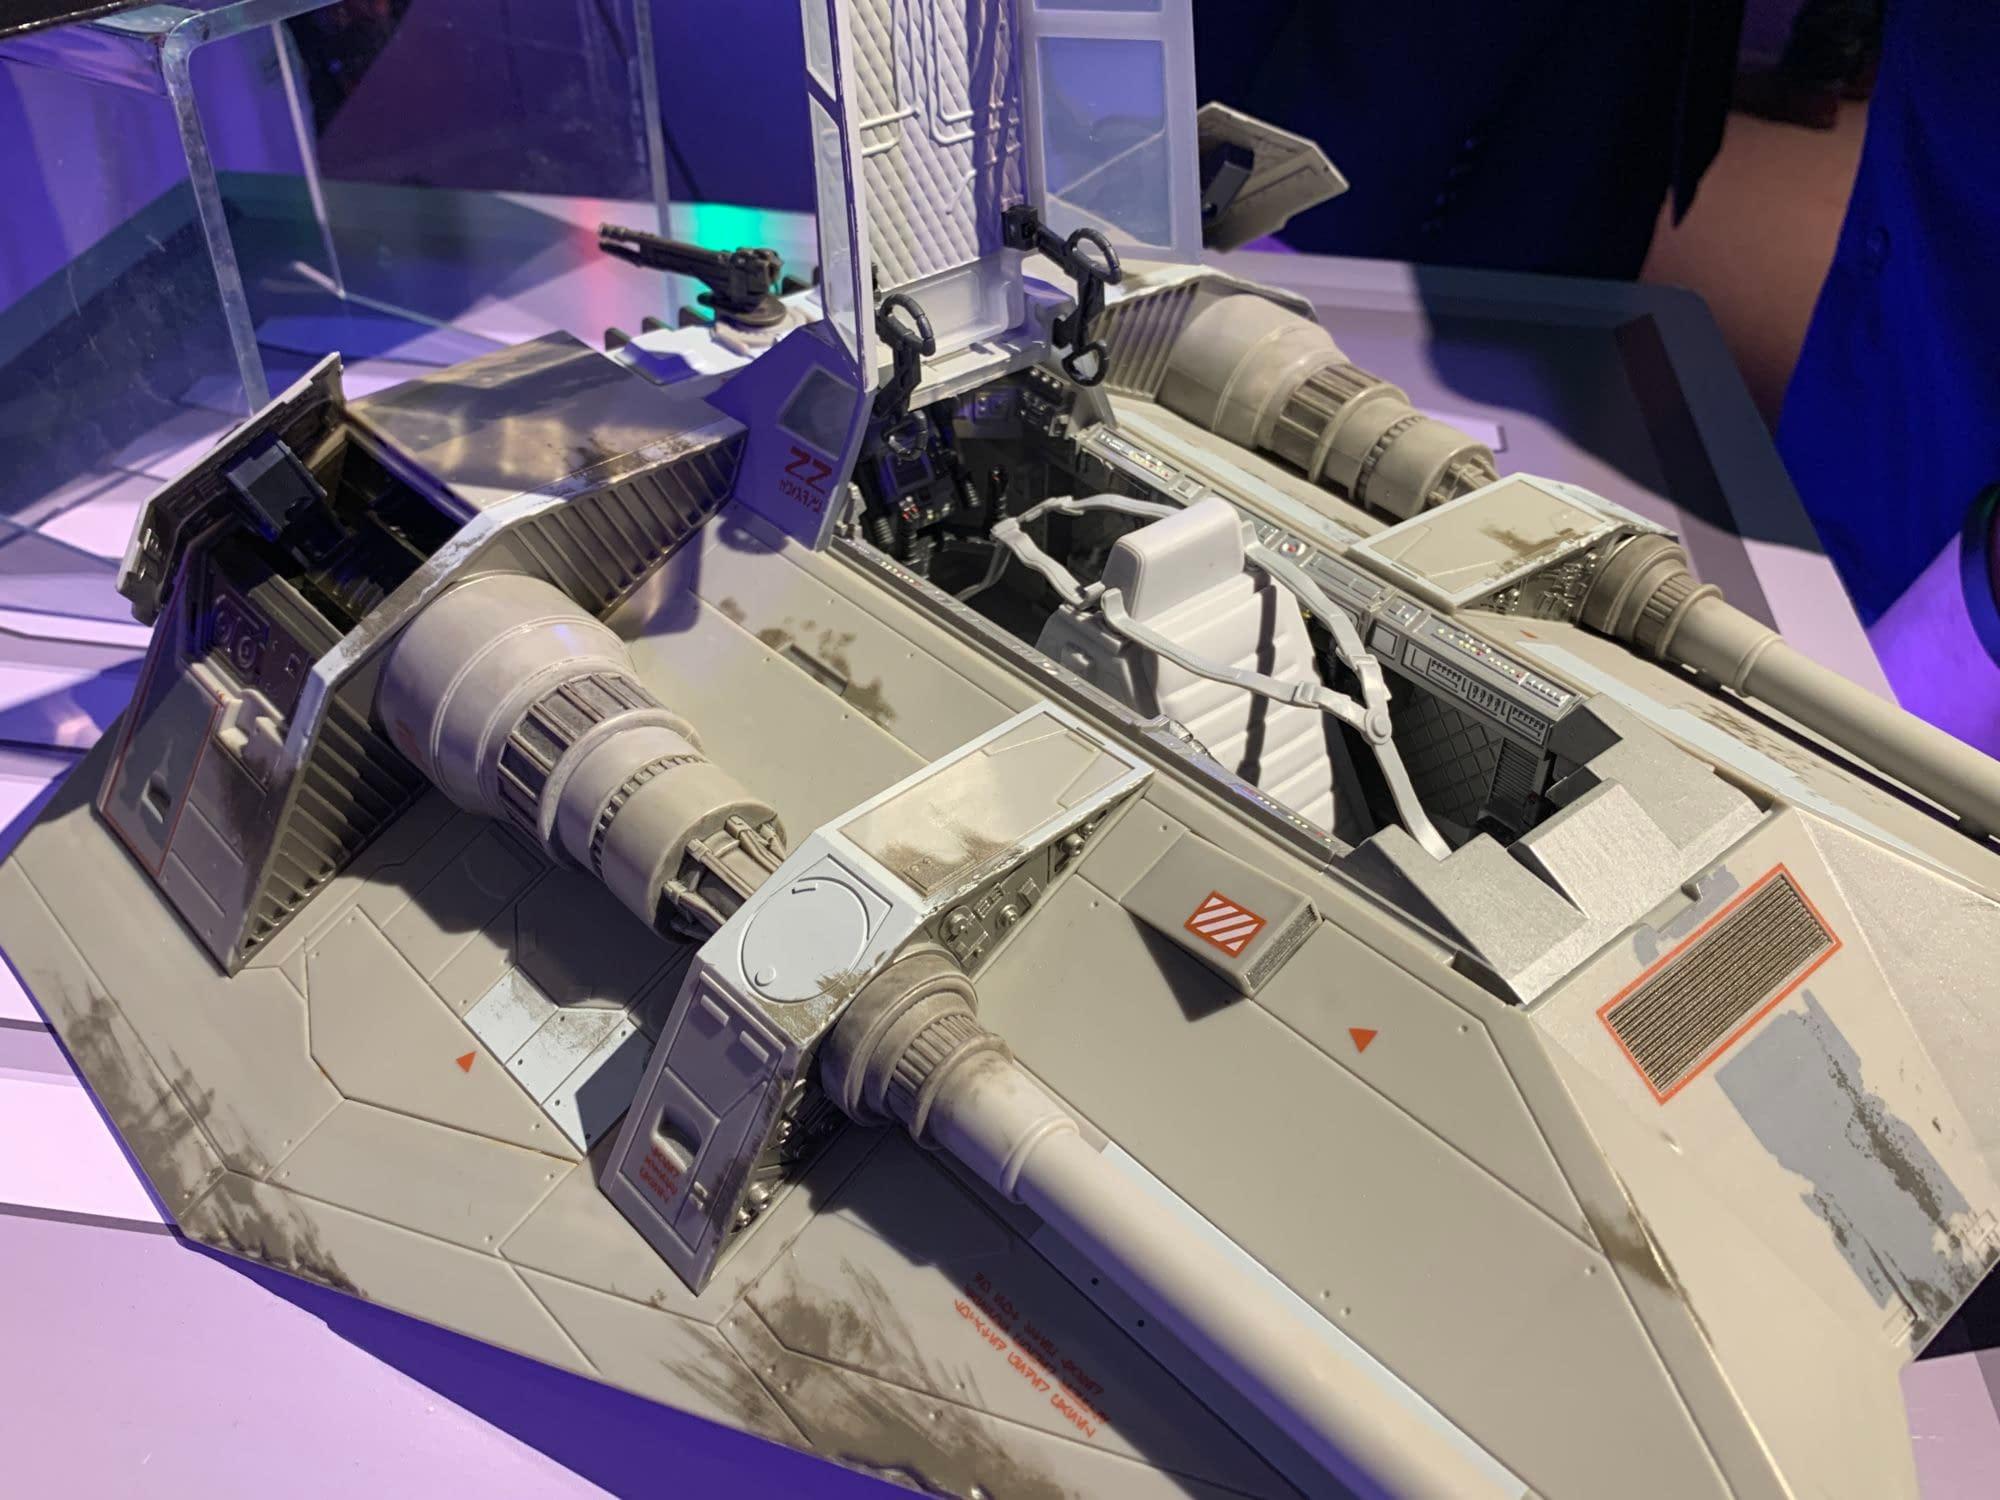 Hasbro New York Toy Fair 2020 - 37 Photos of Star Wars